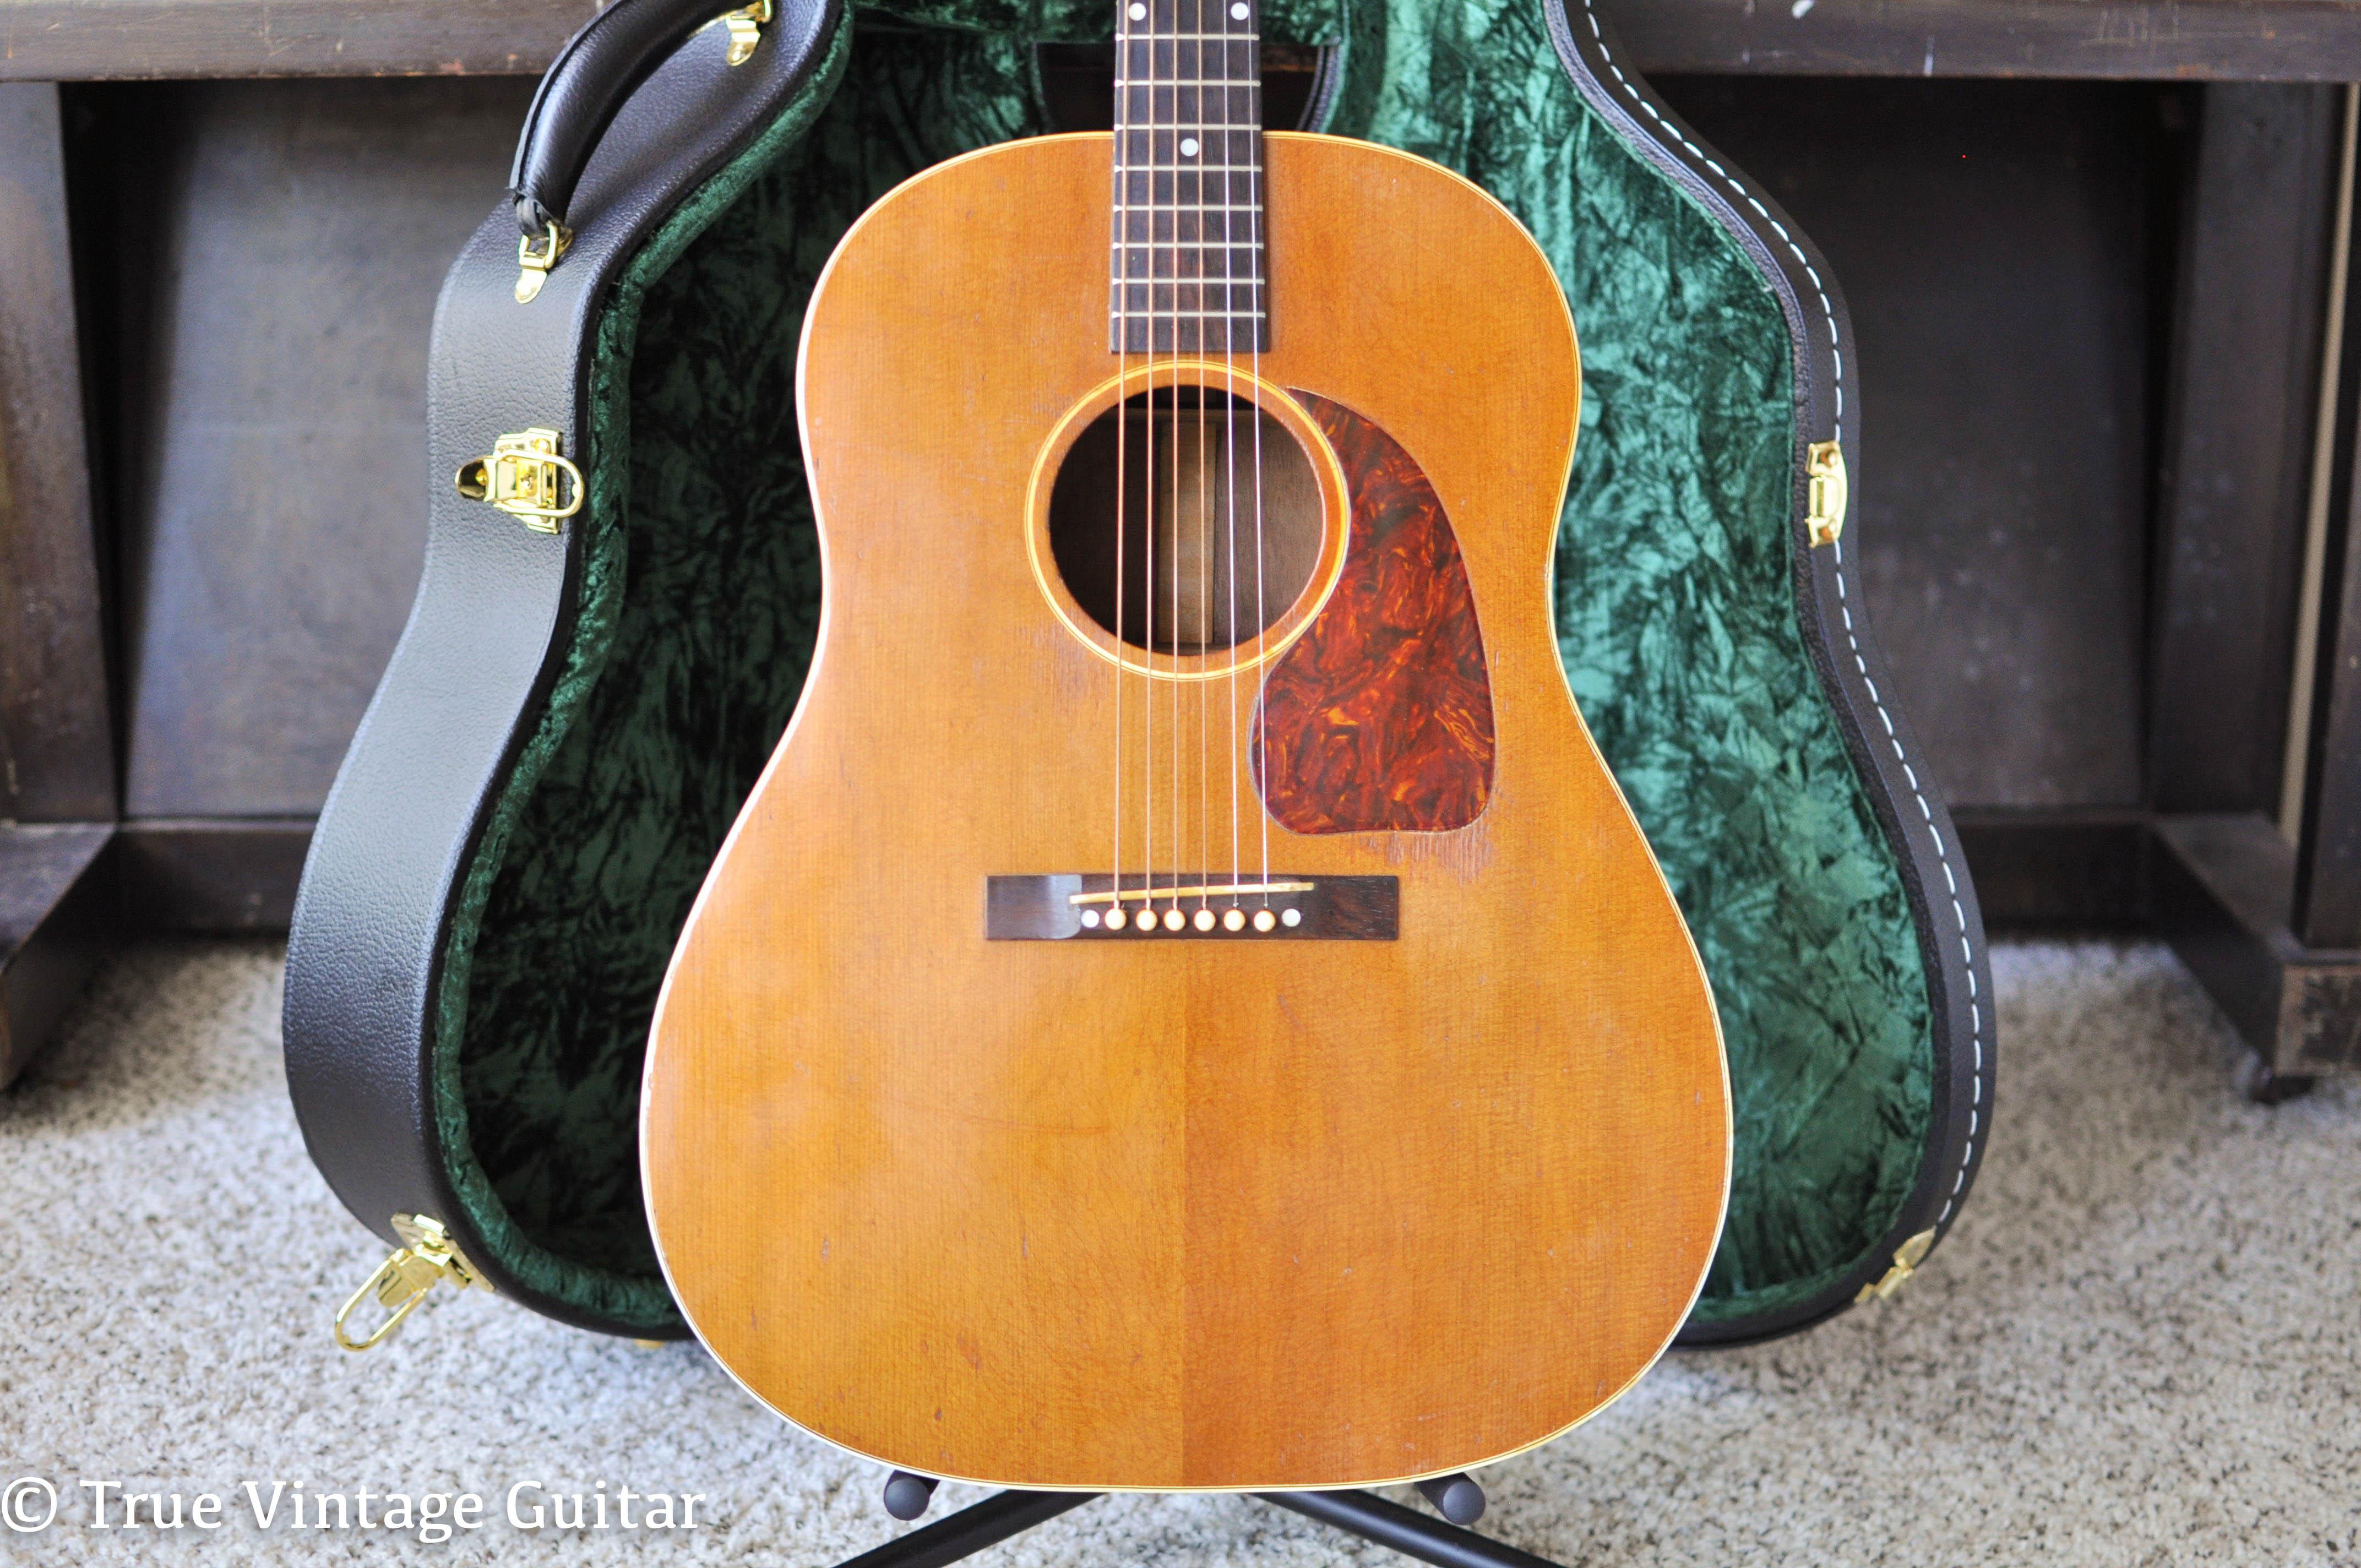 gibson j 50 1947 guitar for sale true vintage guitar